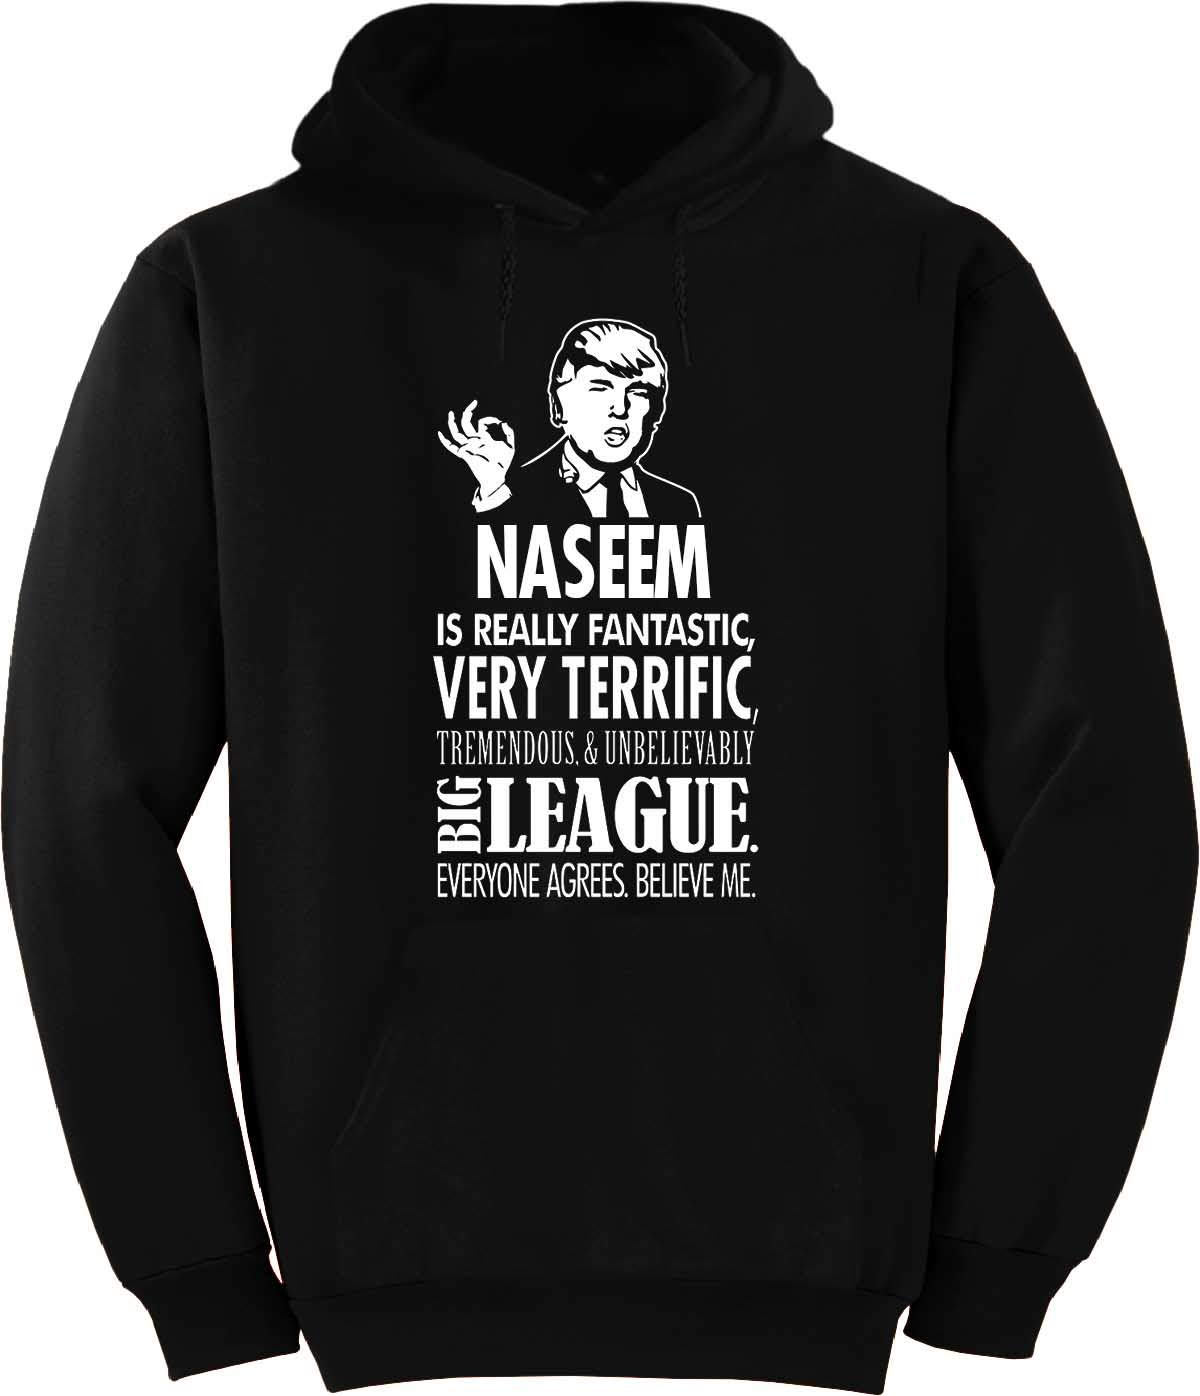 Buffthreads Naseem Trump Big League Terrific T Shirt 9303